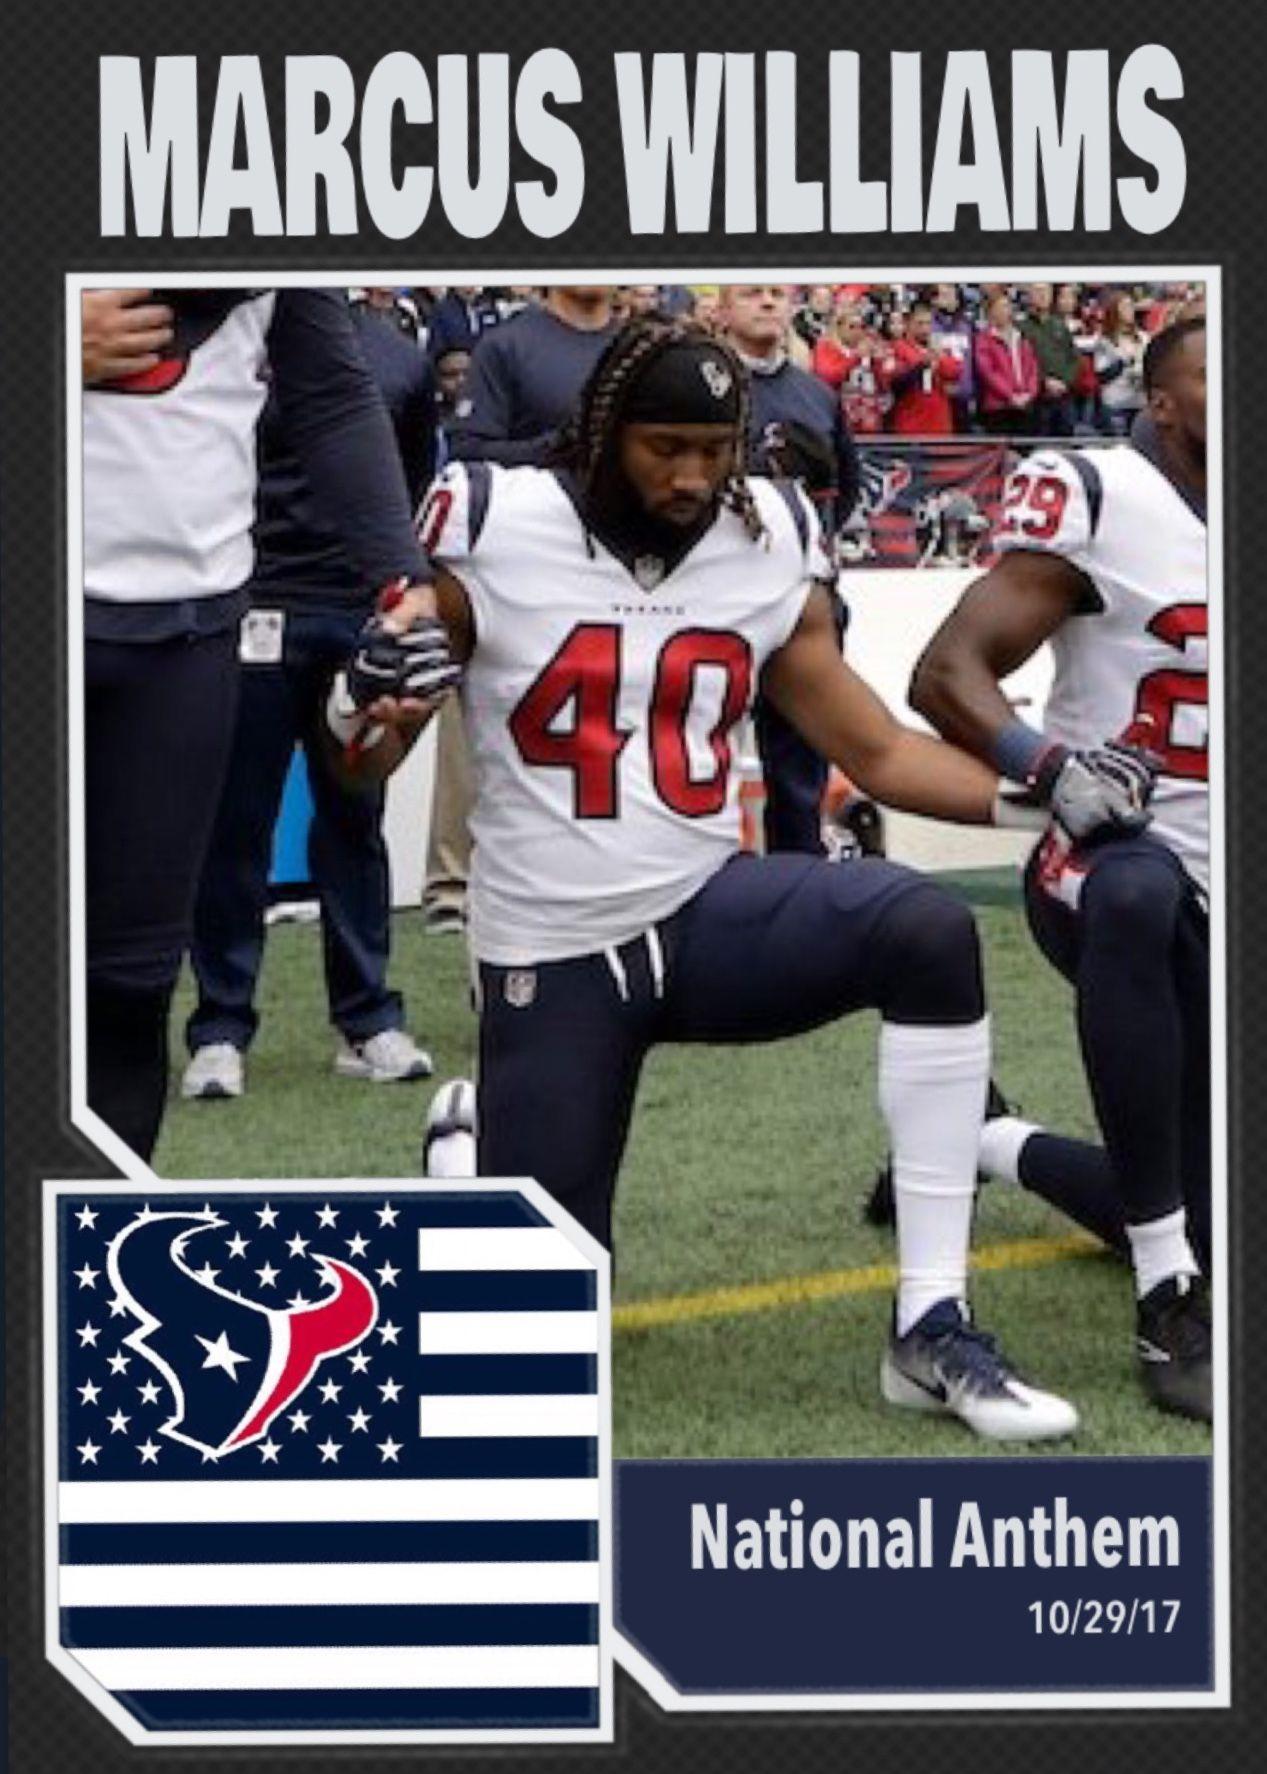 Marcus Williams Houston Texans National Anthem 10 29 17 Imwithkap William Houston National Anthem Anthem